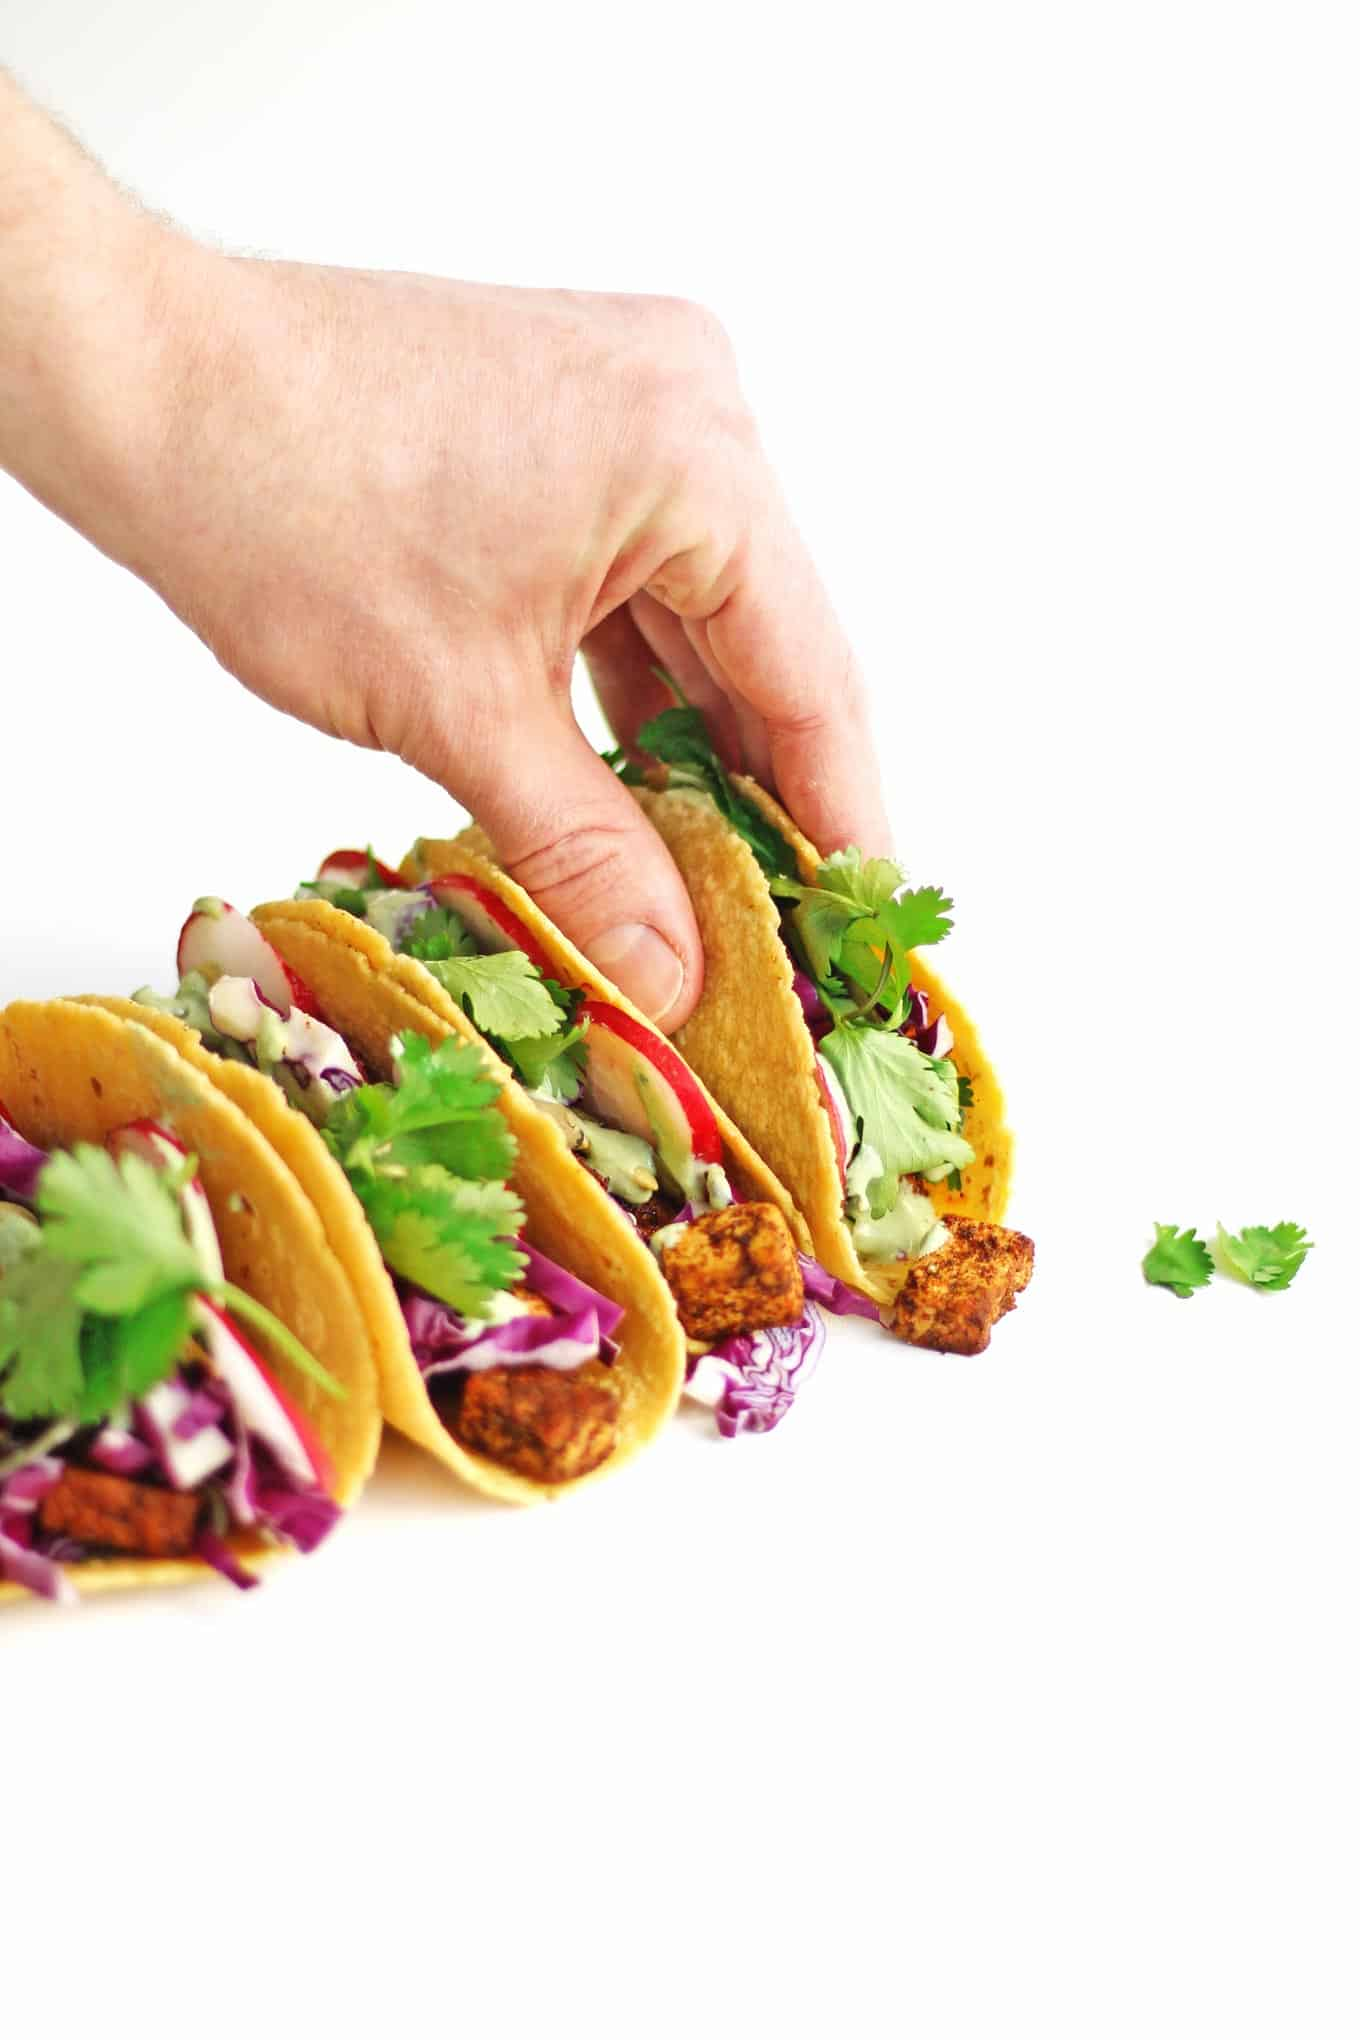 hand grabbing a vegan tofu taco